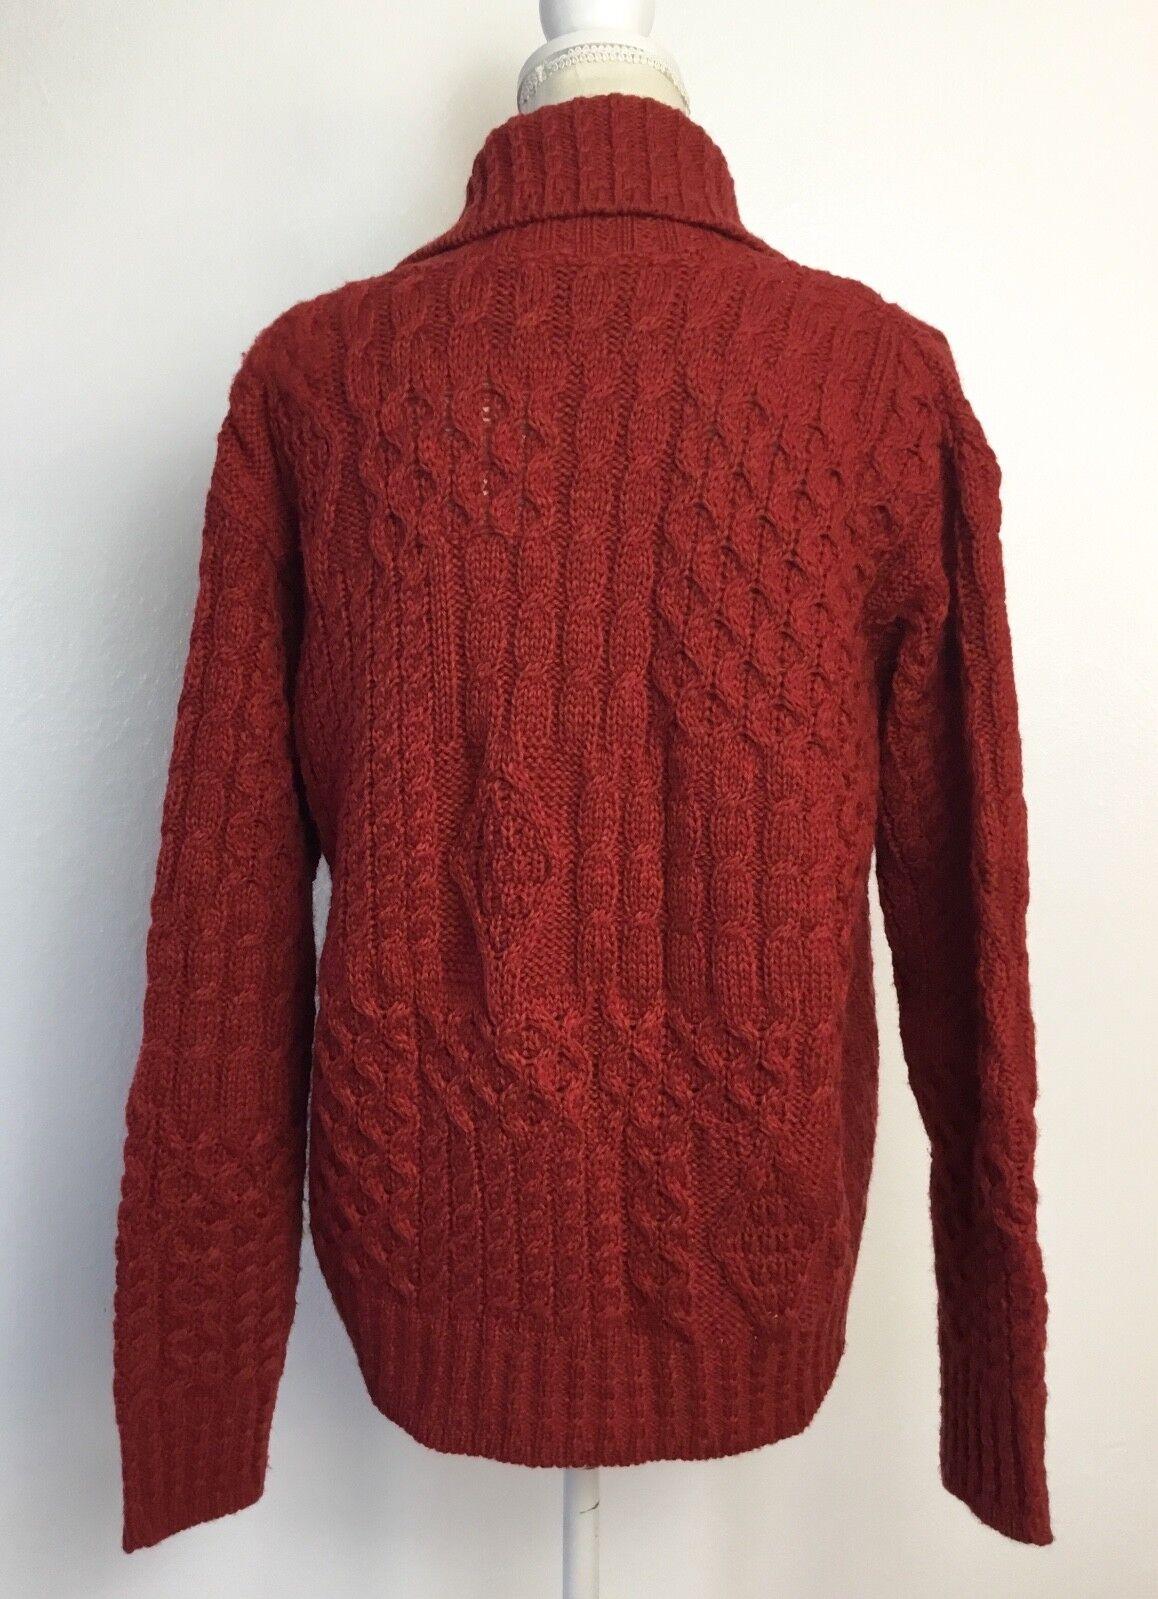 Aran Crafts Crafts Crafts Knit One Button Cardigan Ireland 51e333